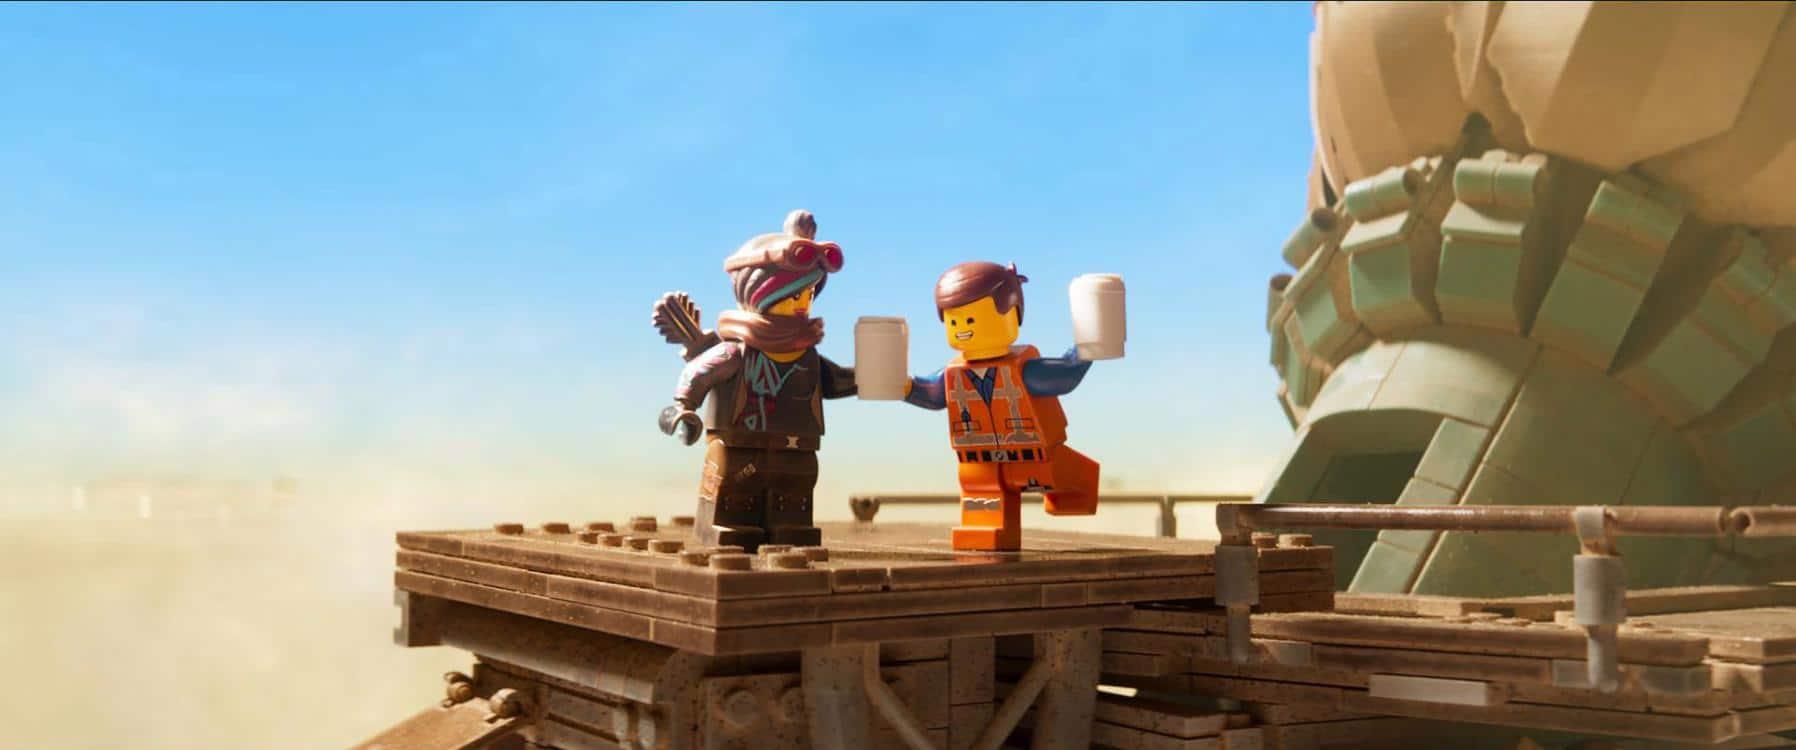 De Lego Film 2   winactie